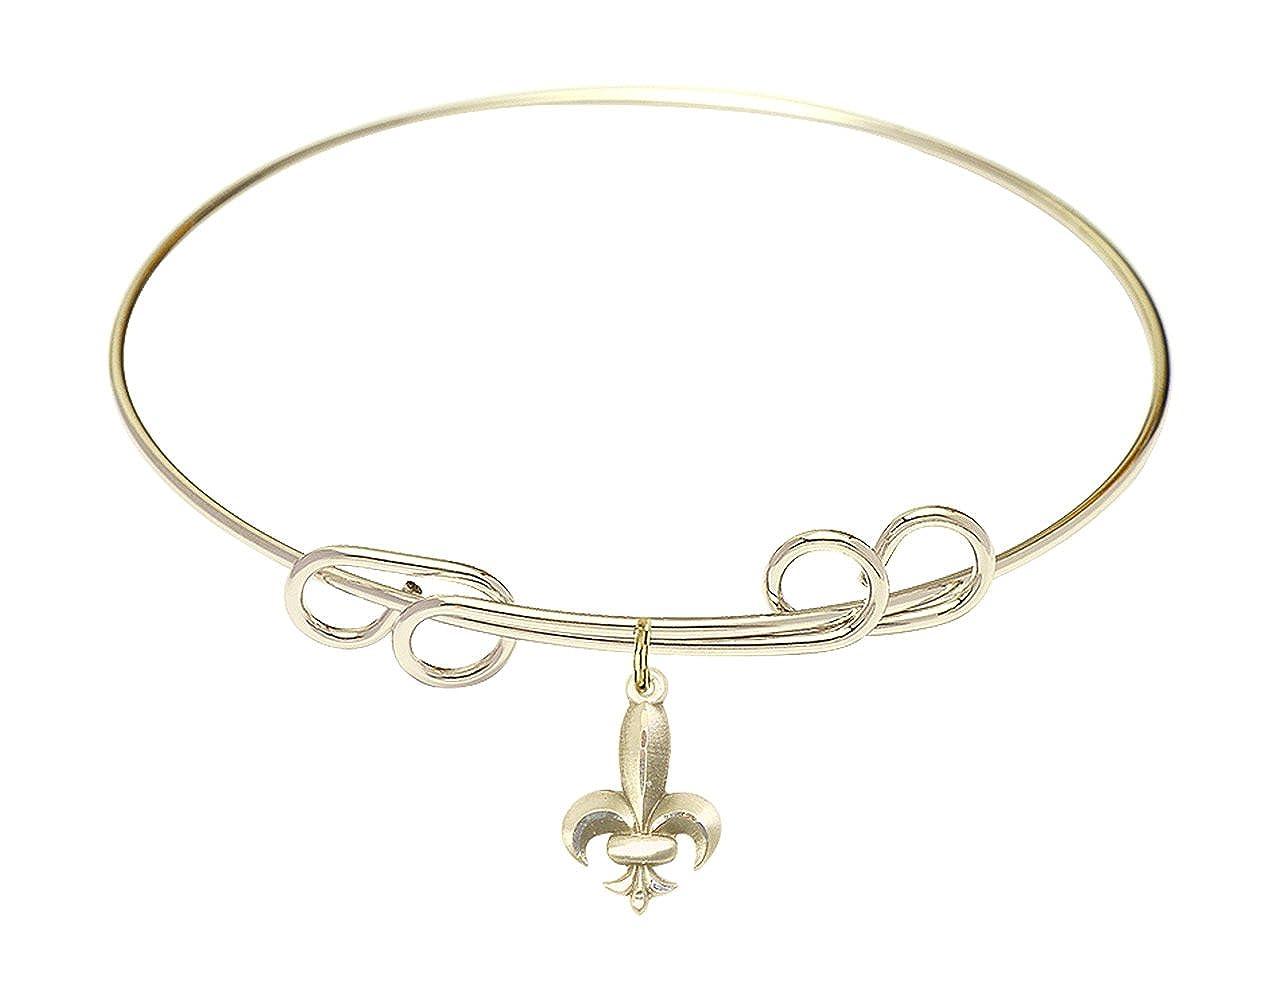 DiamondJewelryNY Double Loop Bangle Bracelet with a Fleur de Lis Charm.